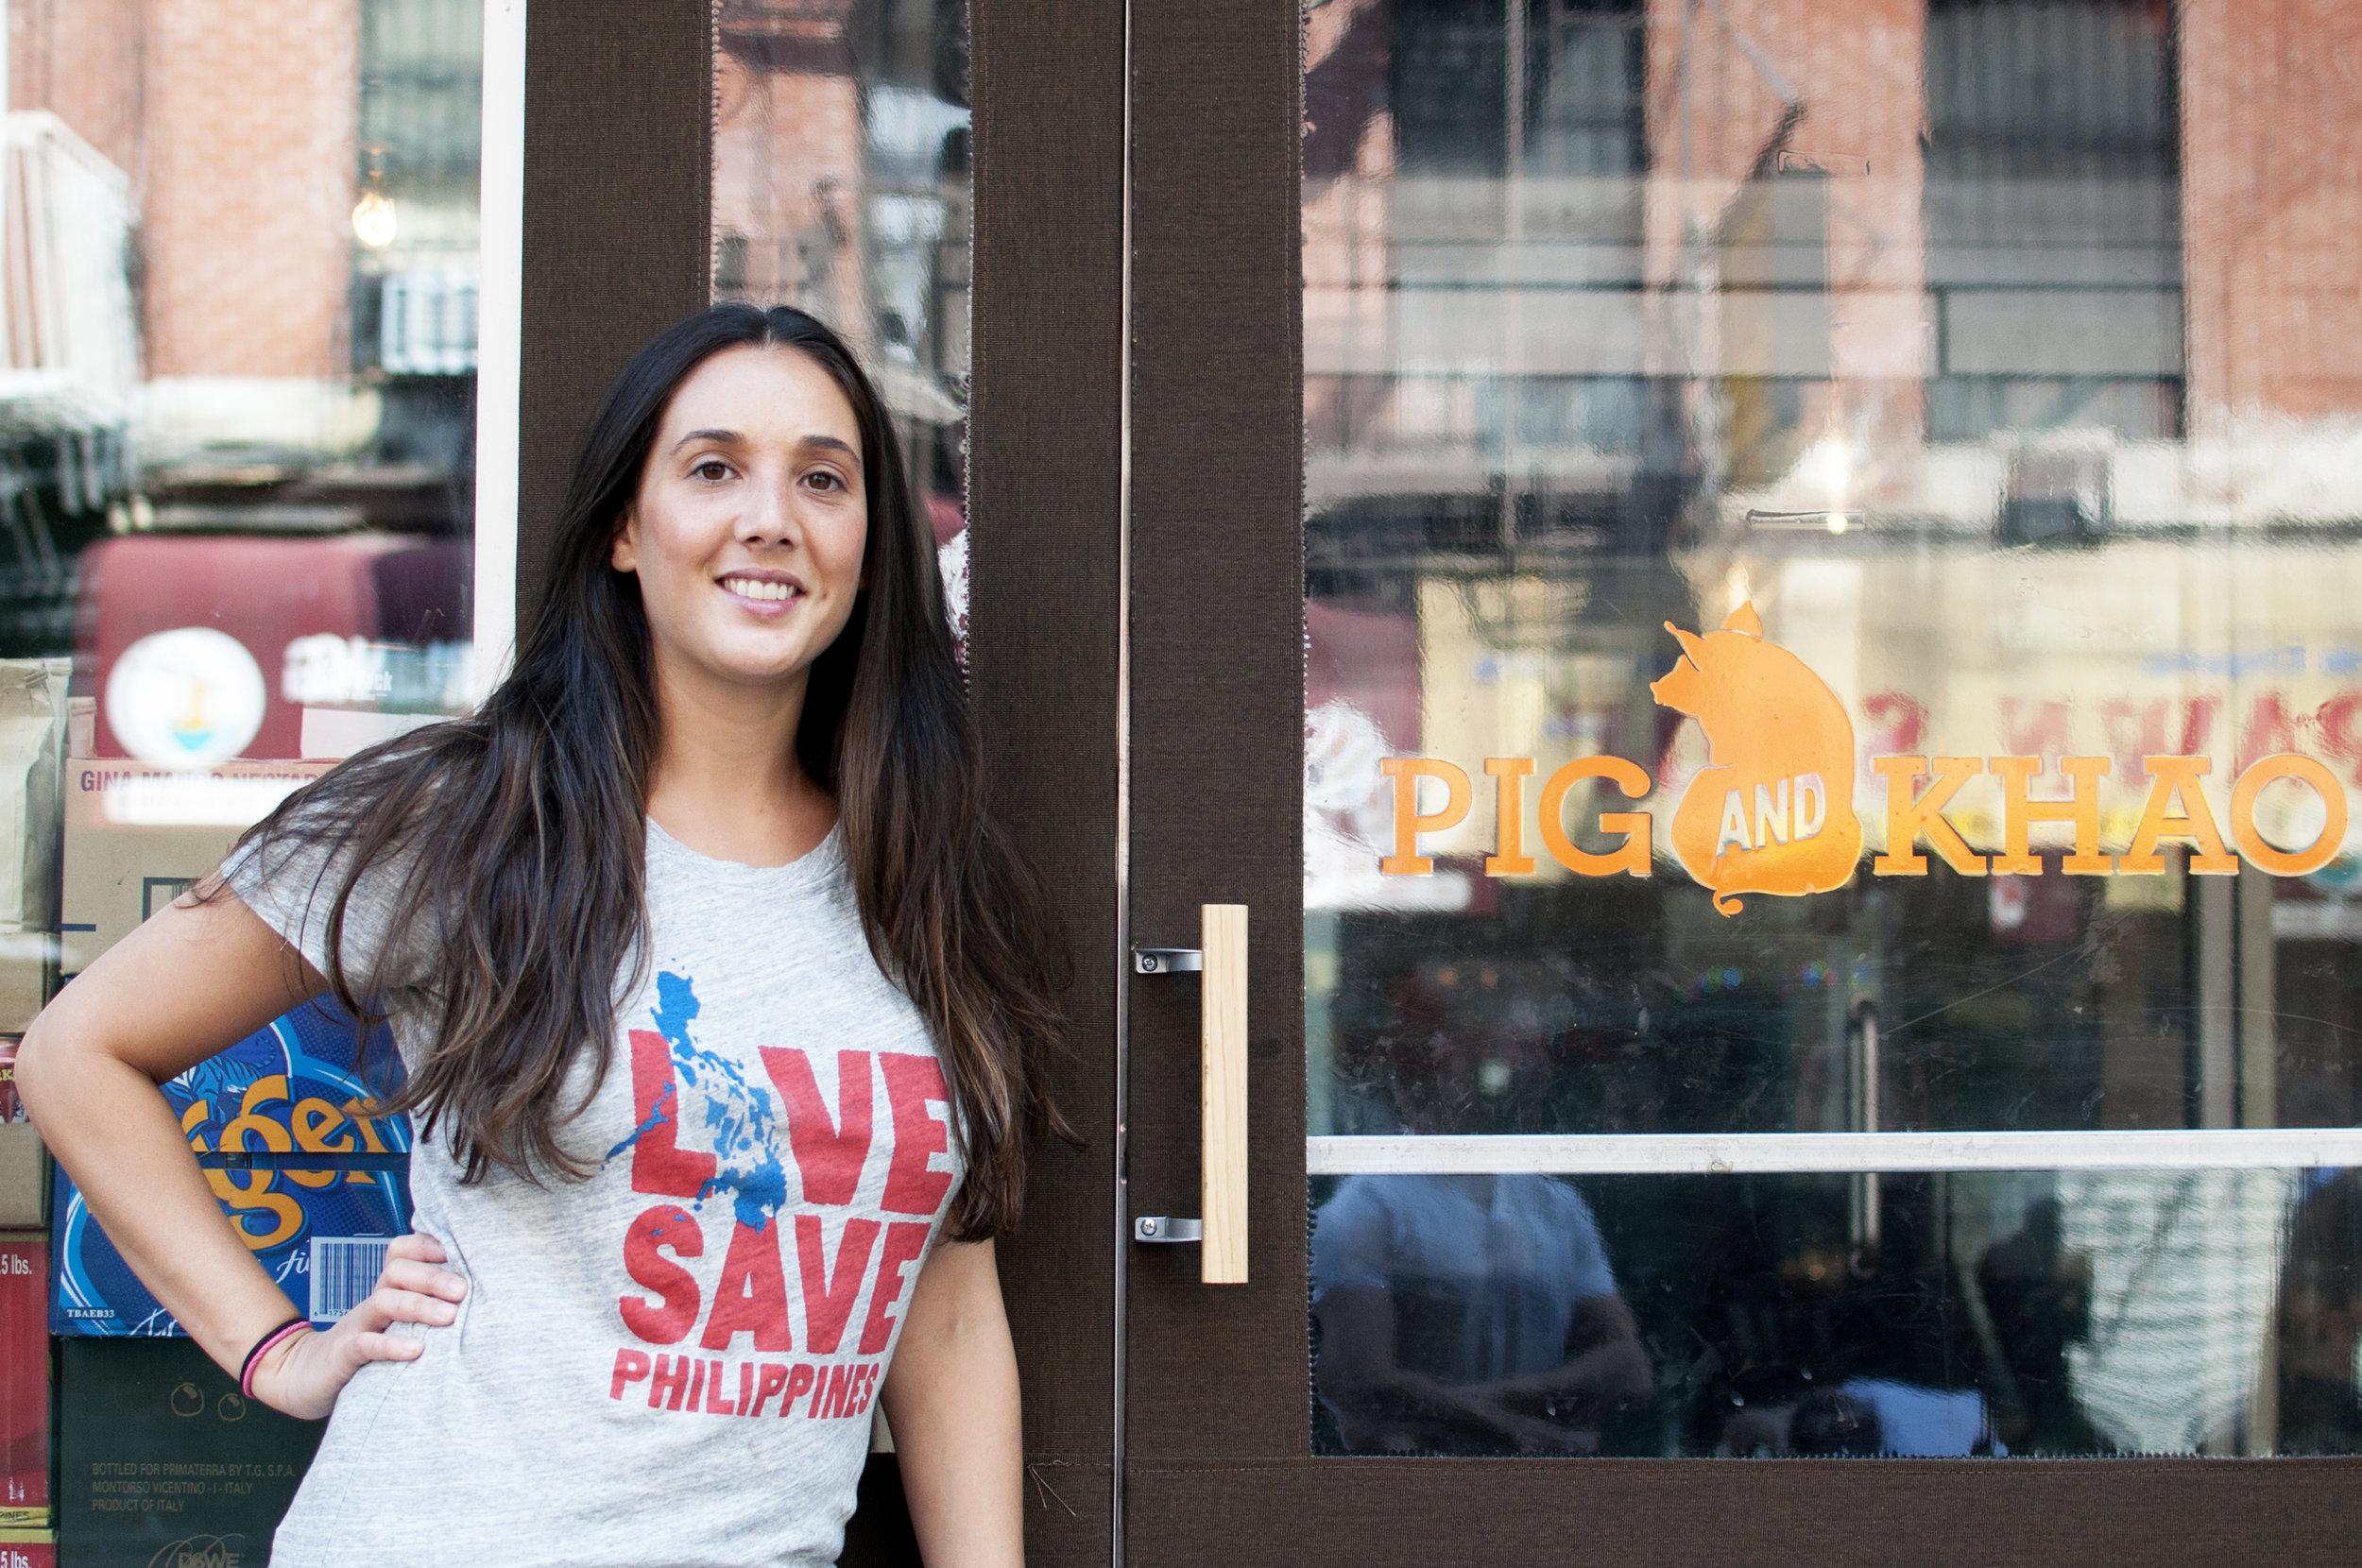 Chef Leah Cohen outside her New York restaurant, Pig & Khao